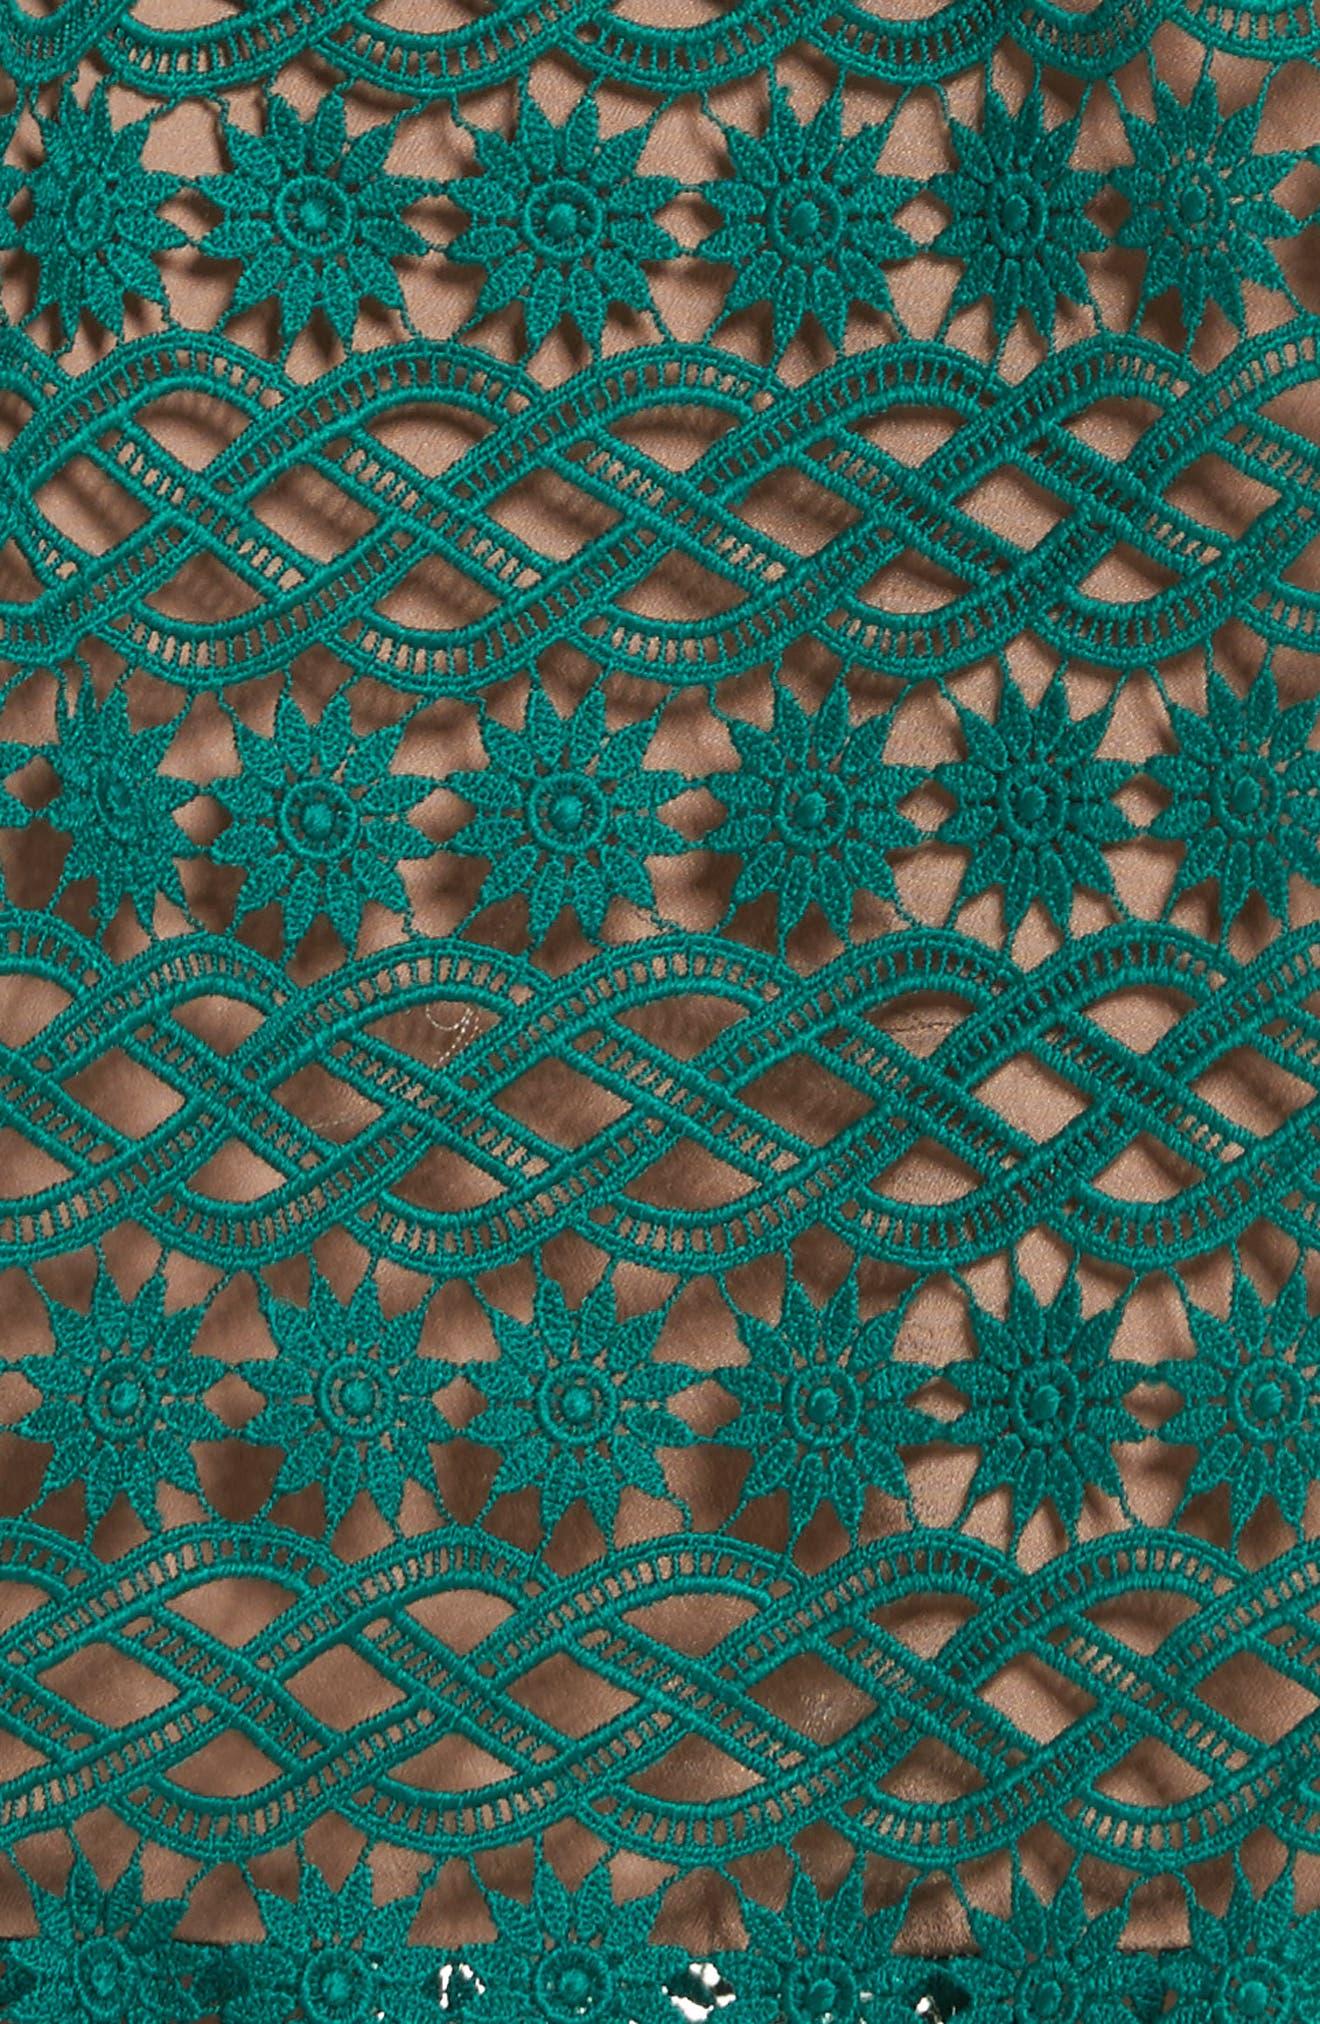 Lace One-Shoulder Midi Dress,                             Alternate thumbnail 5, color,                             300